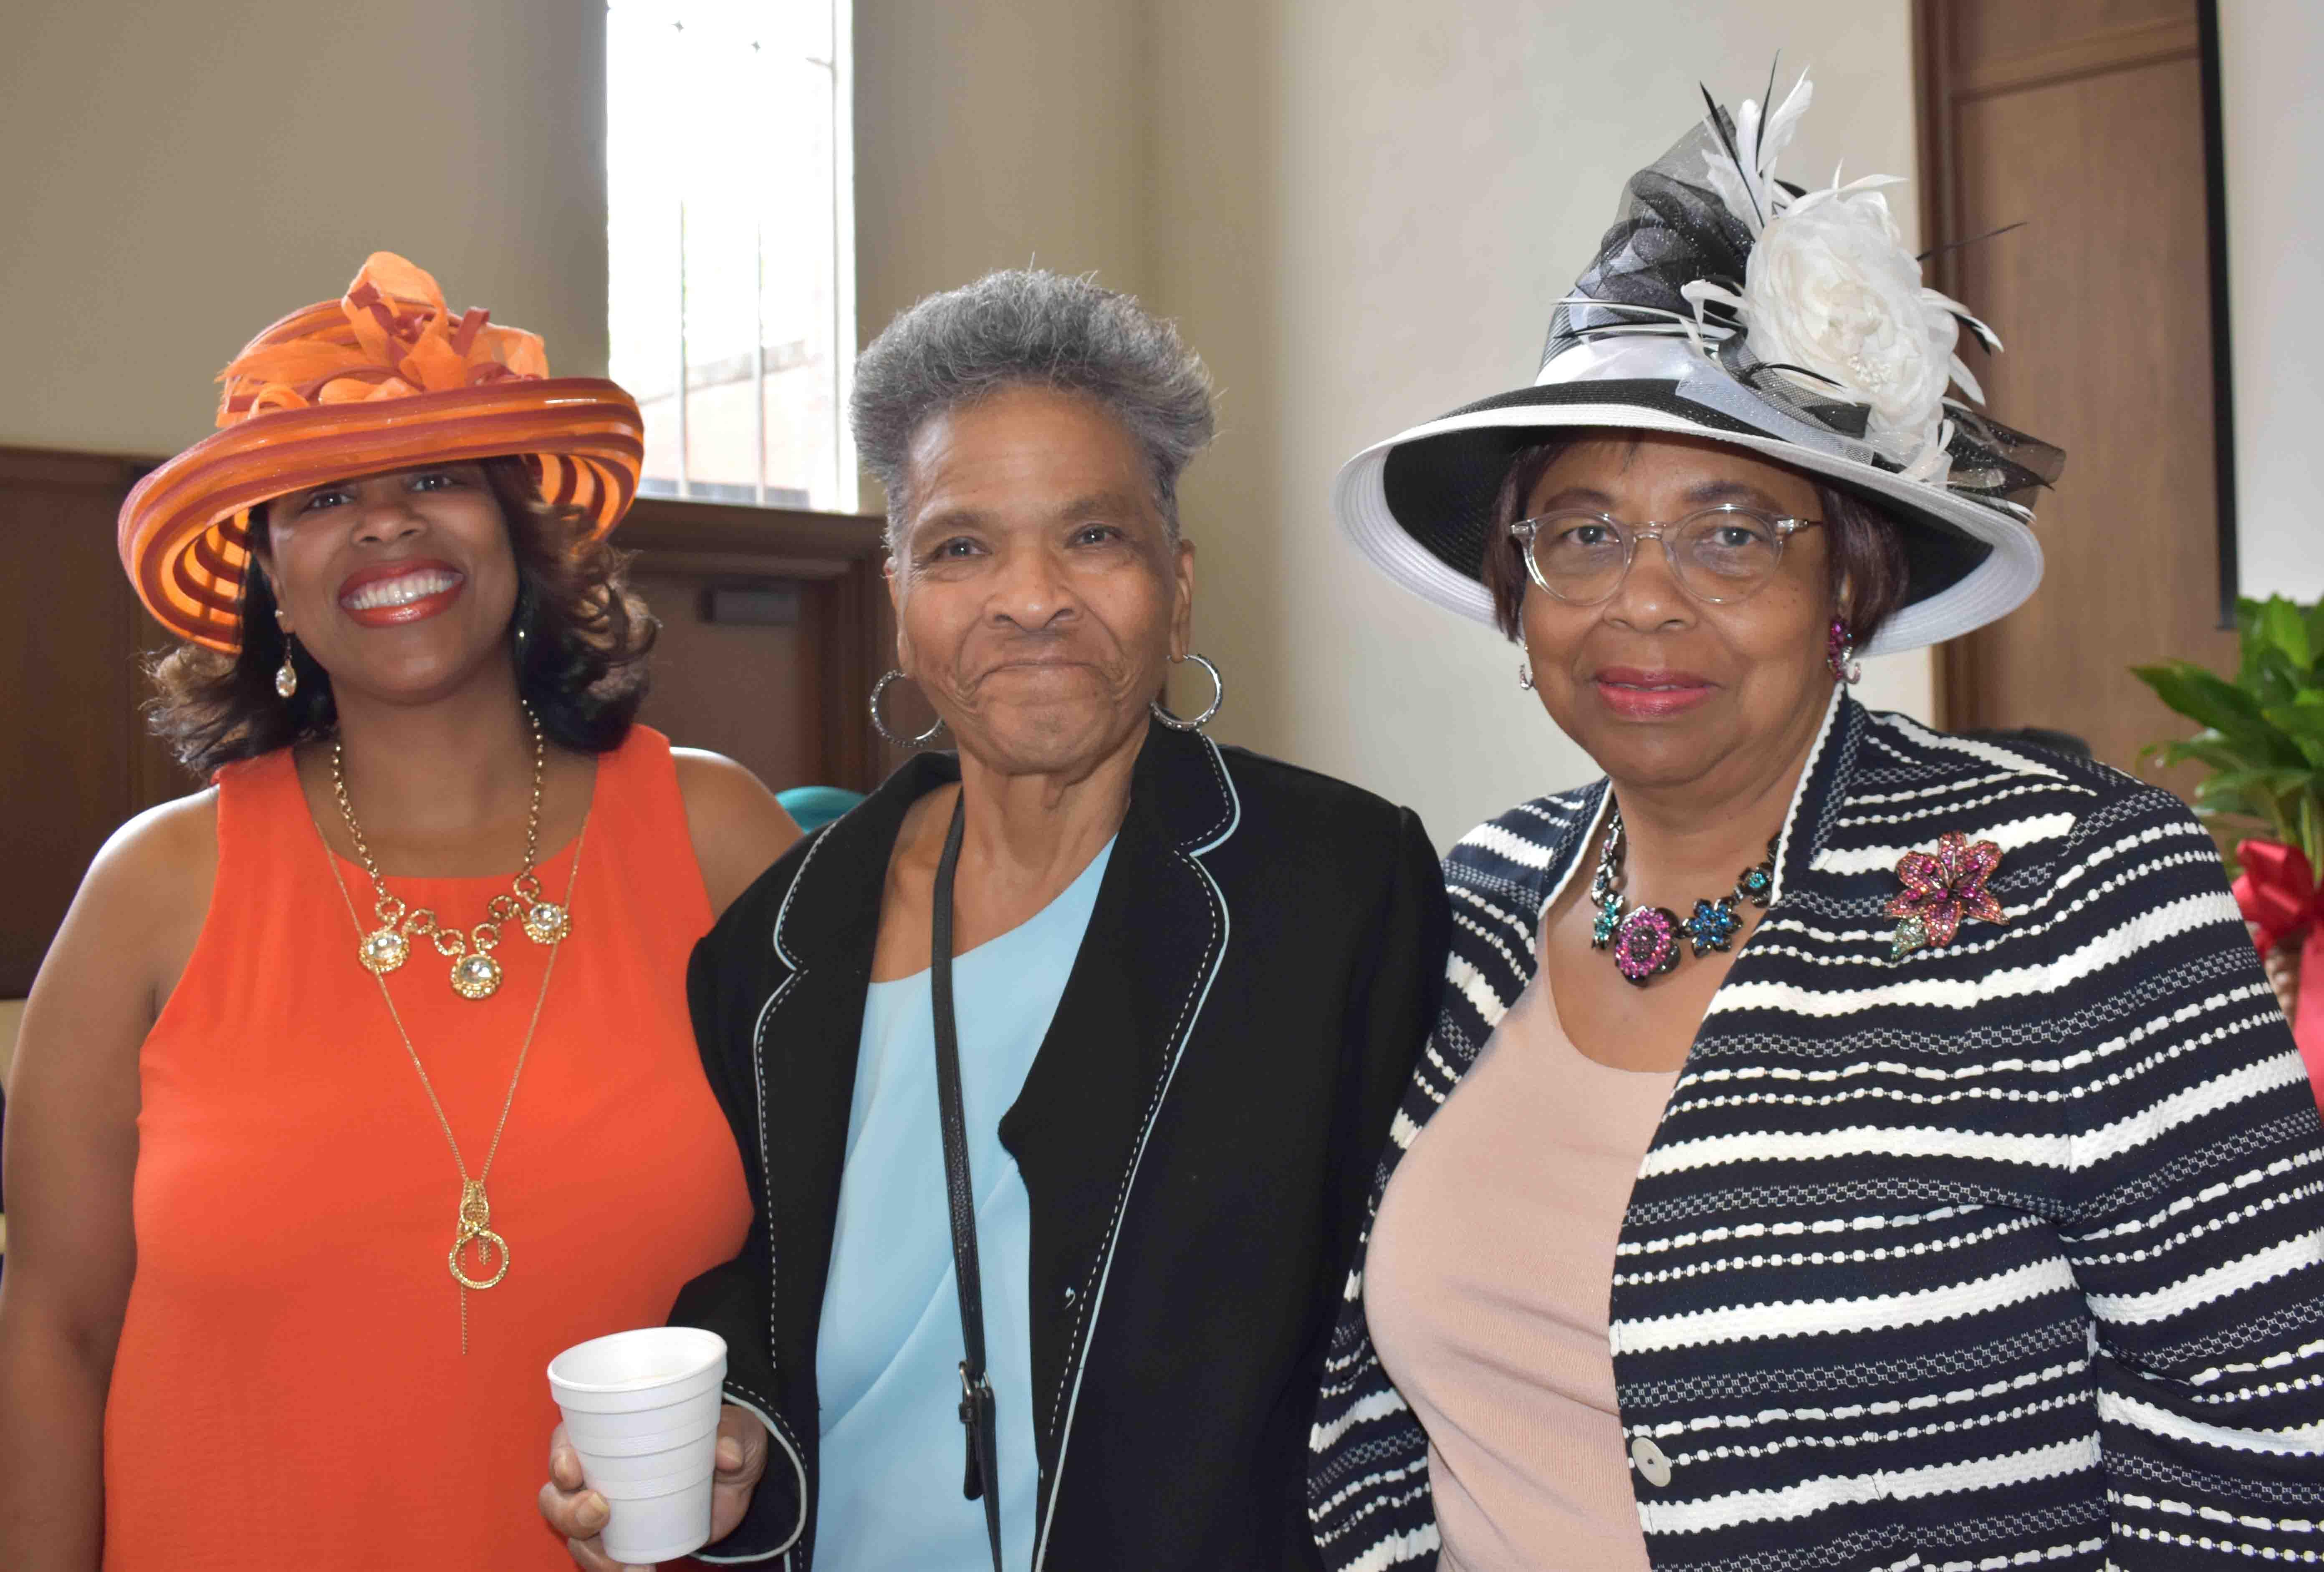 Rev. Tameka Lamb Green, Dr. Katherine Mitchell, Mary Bell